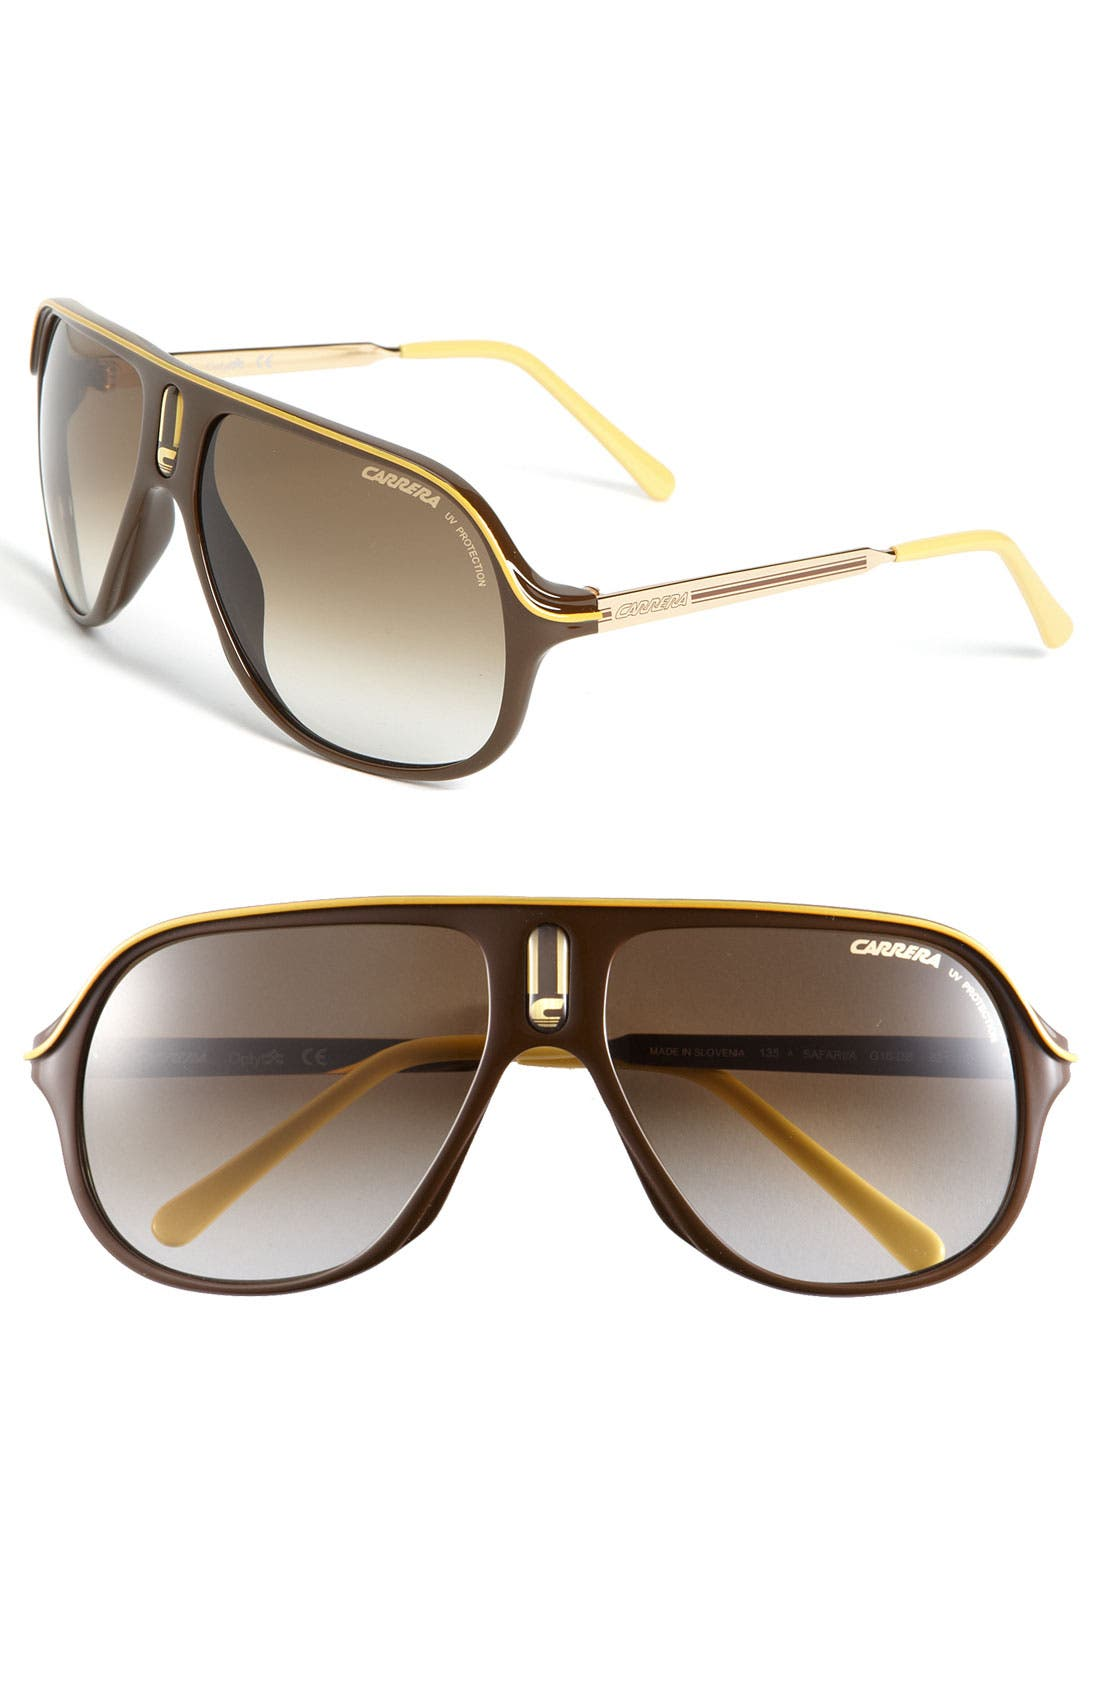 Main Image - Carrera Eyewear 'Safari' Polarized Aviator Sunglasses